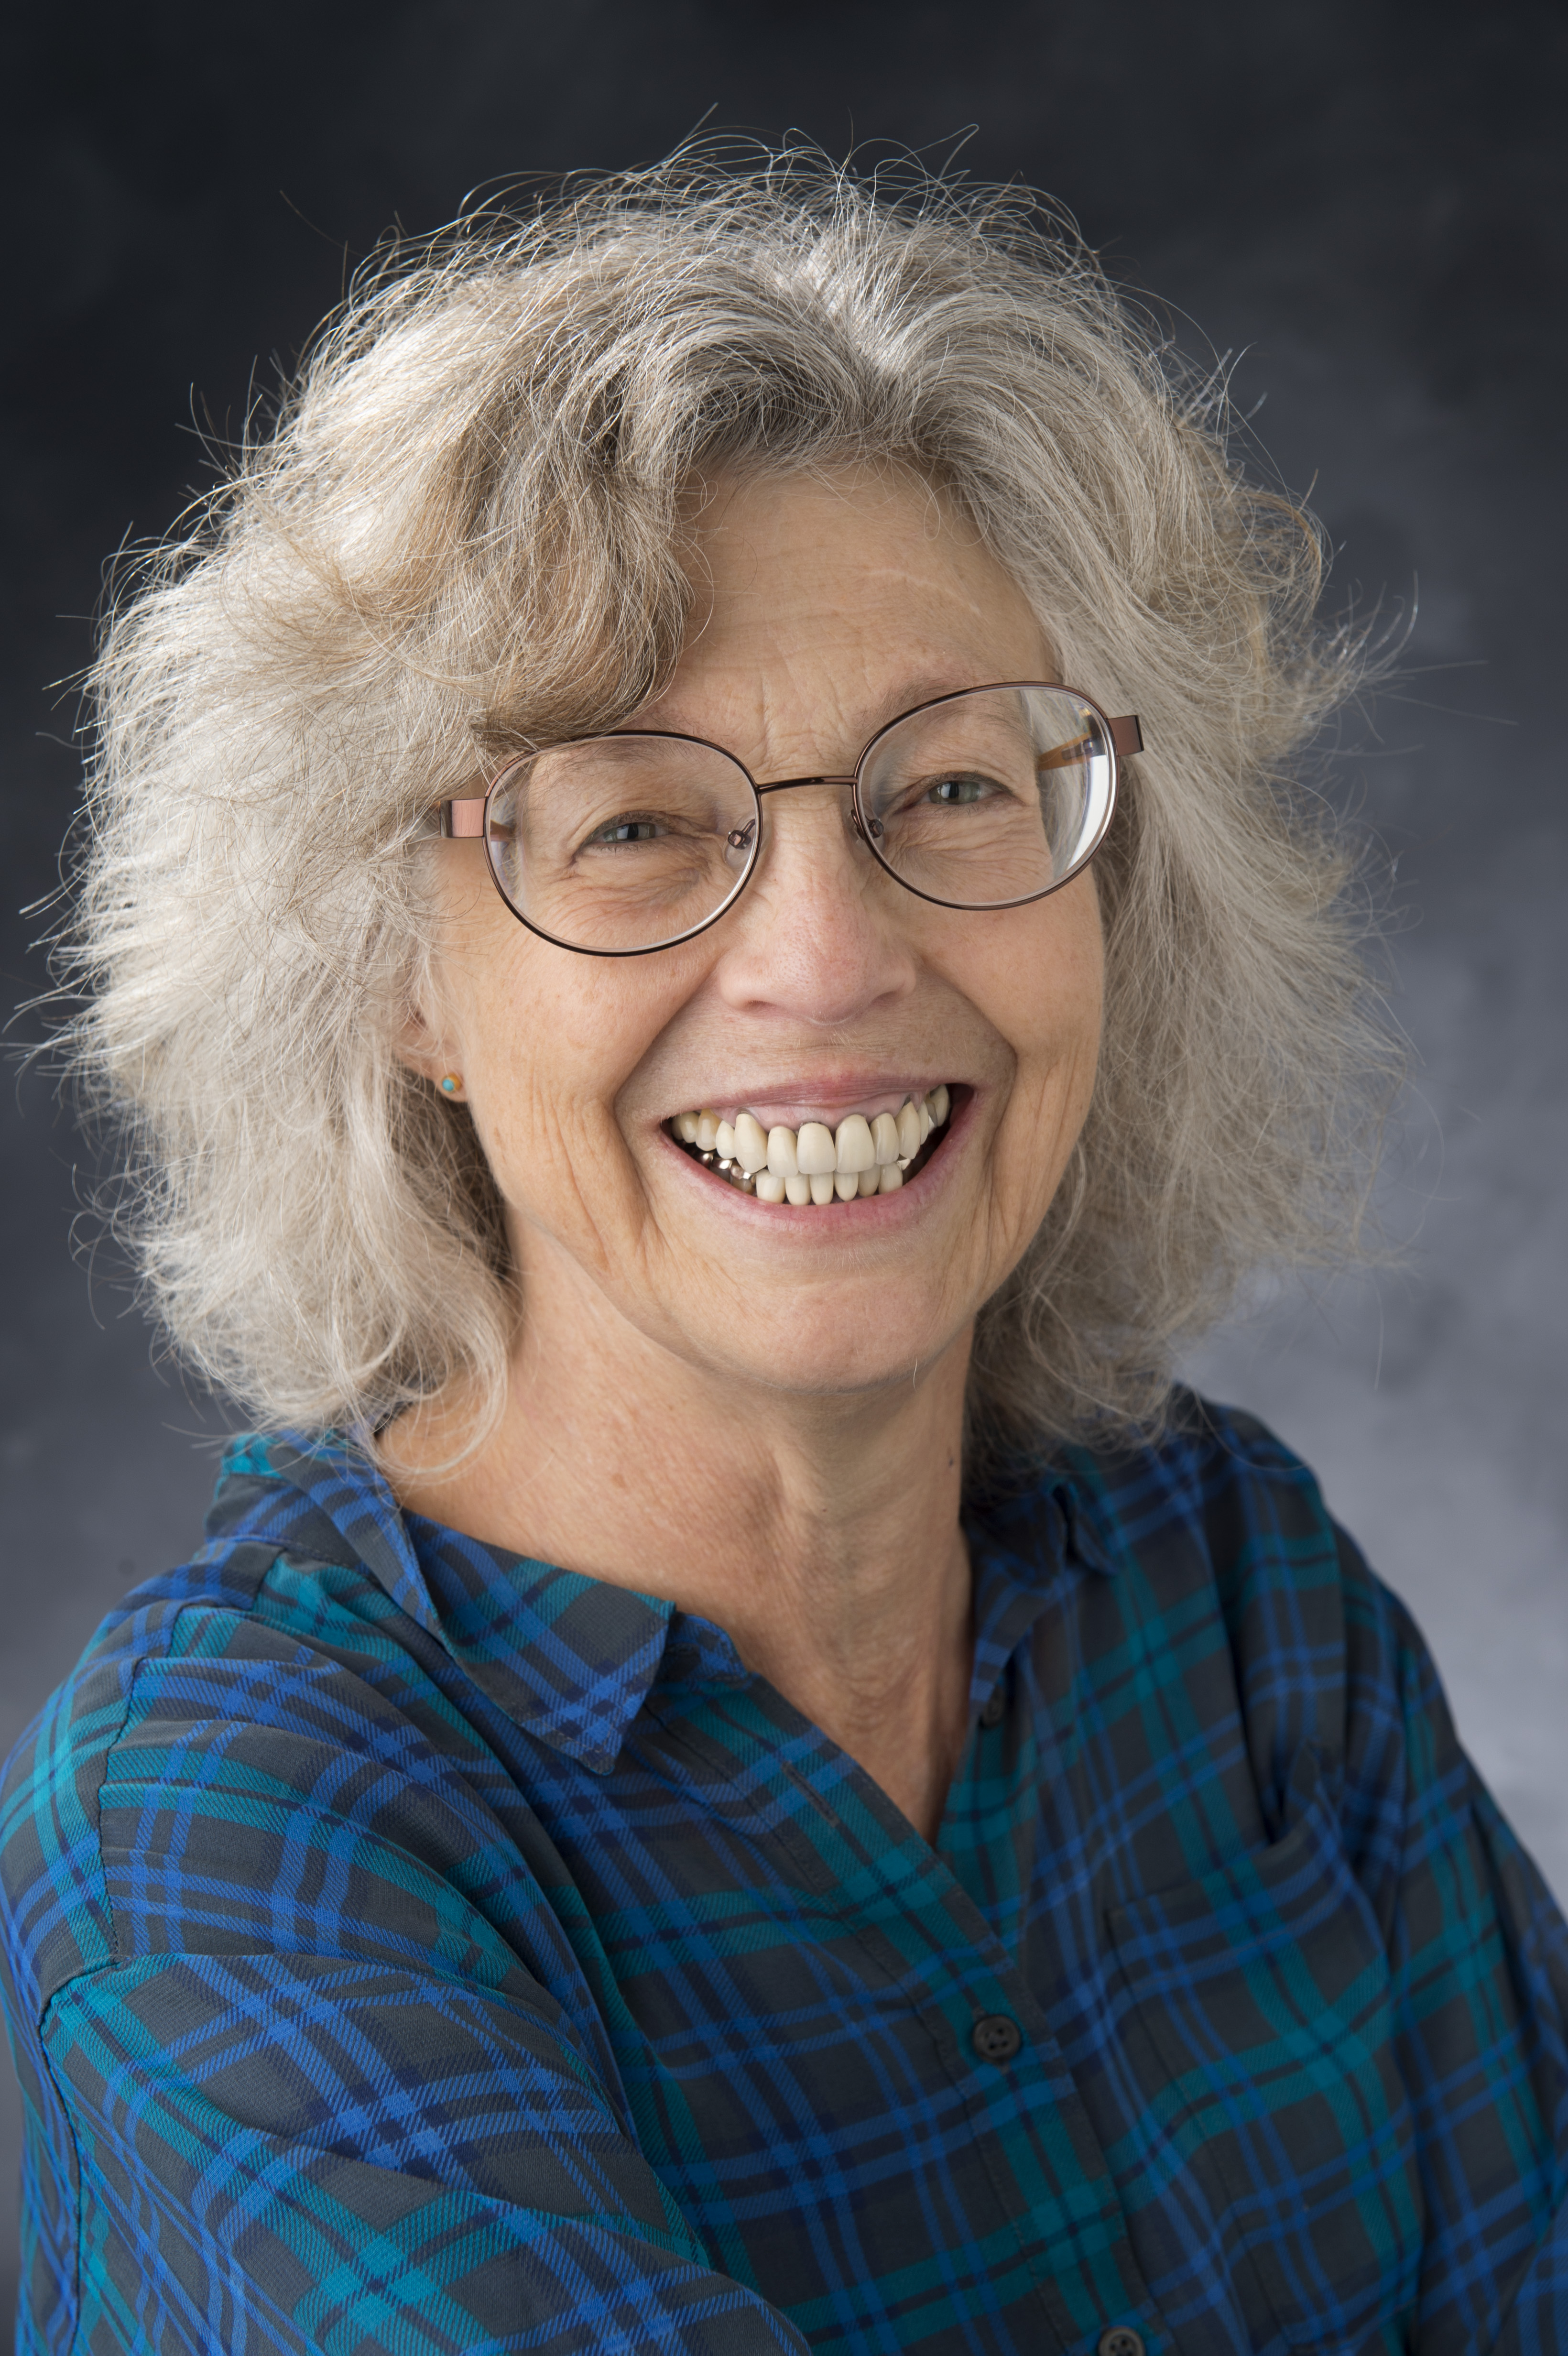 Judy Polumbaum portrait